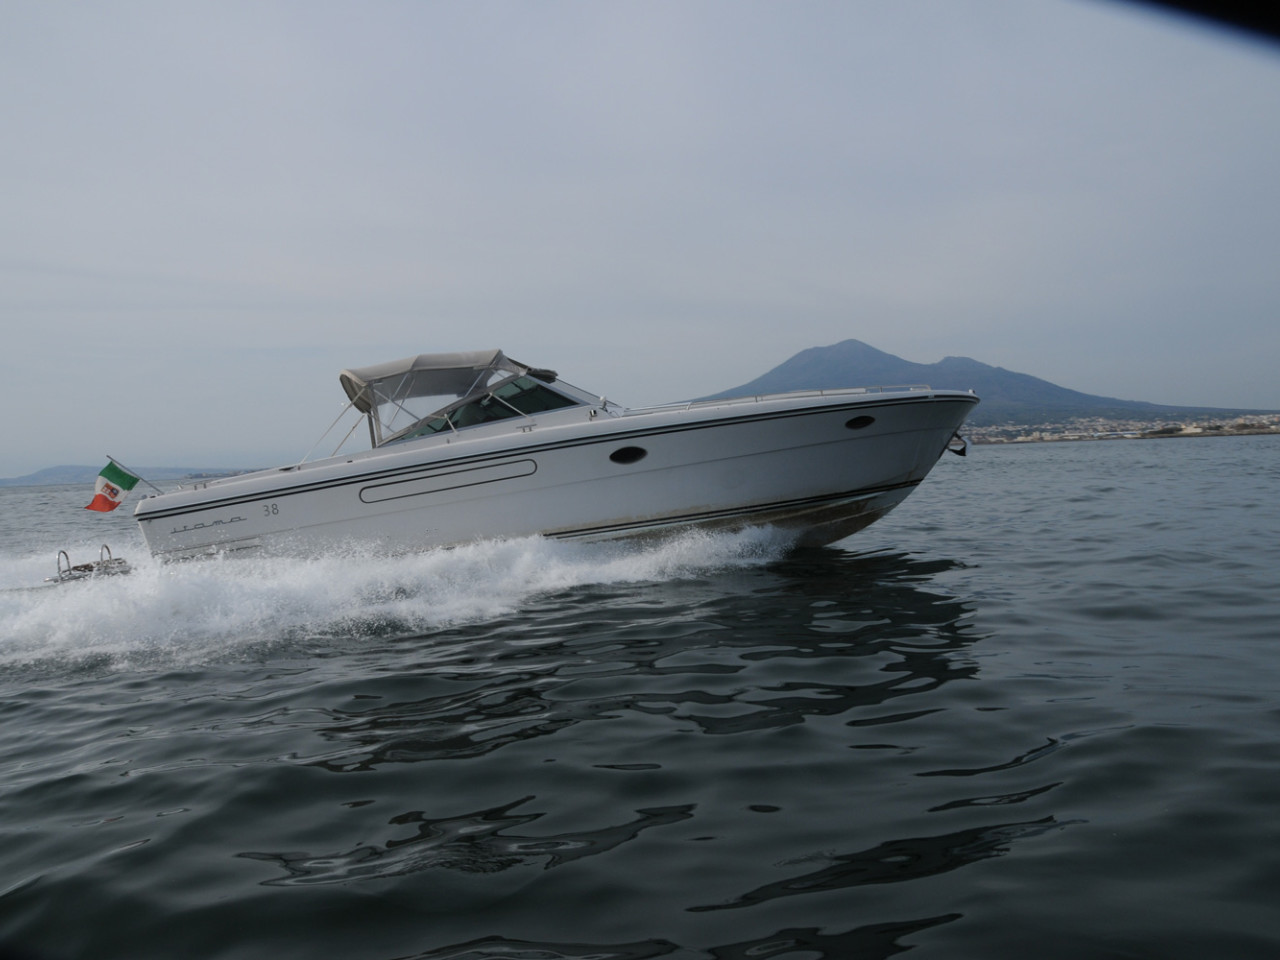 Cuor di Leone Itama 38 | Amalfi coast boat rental